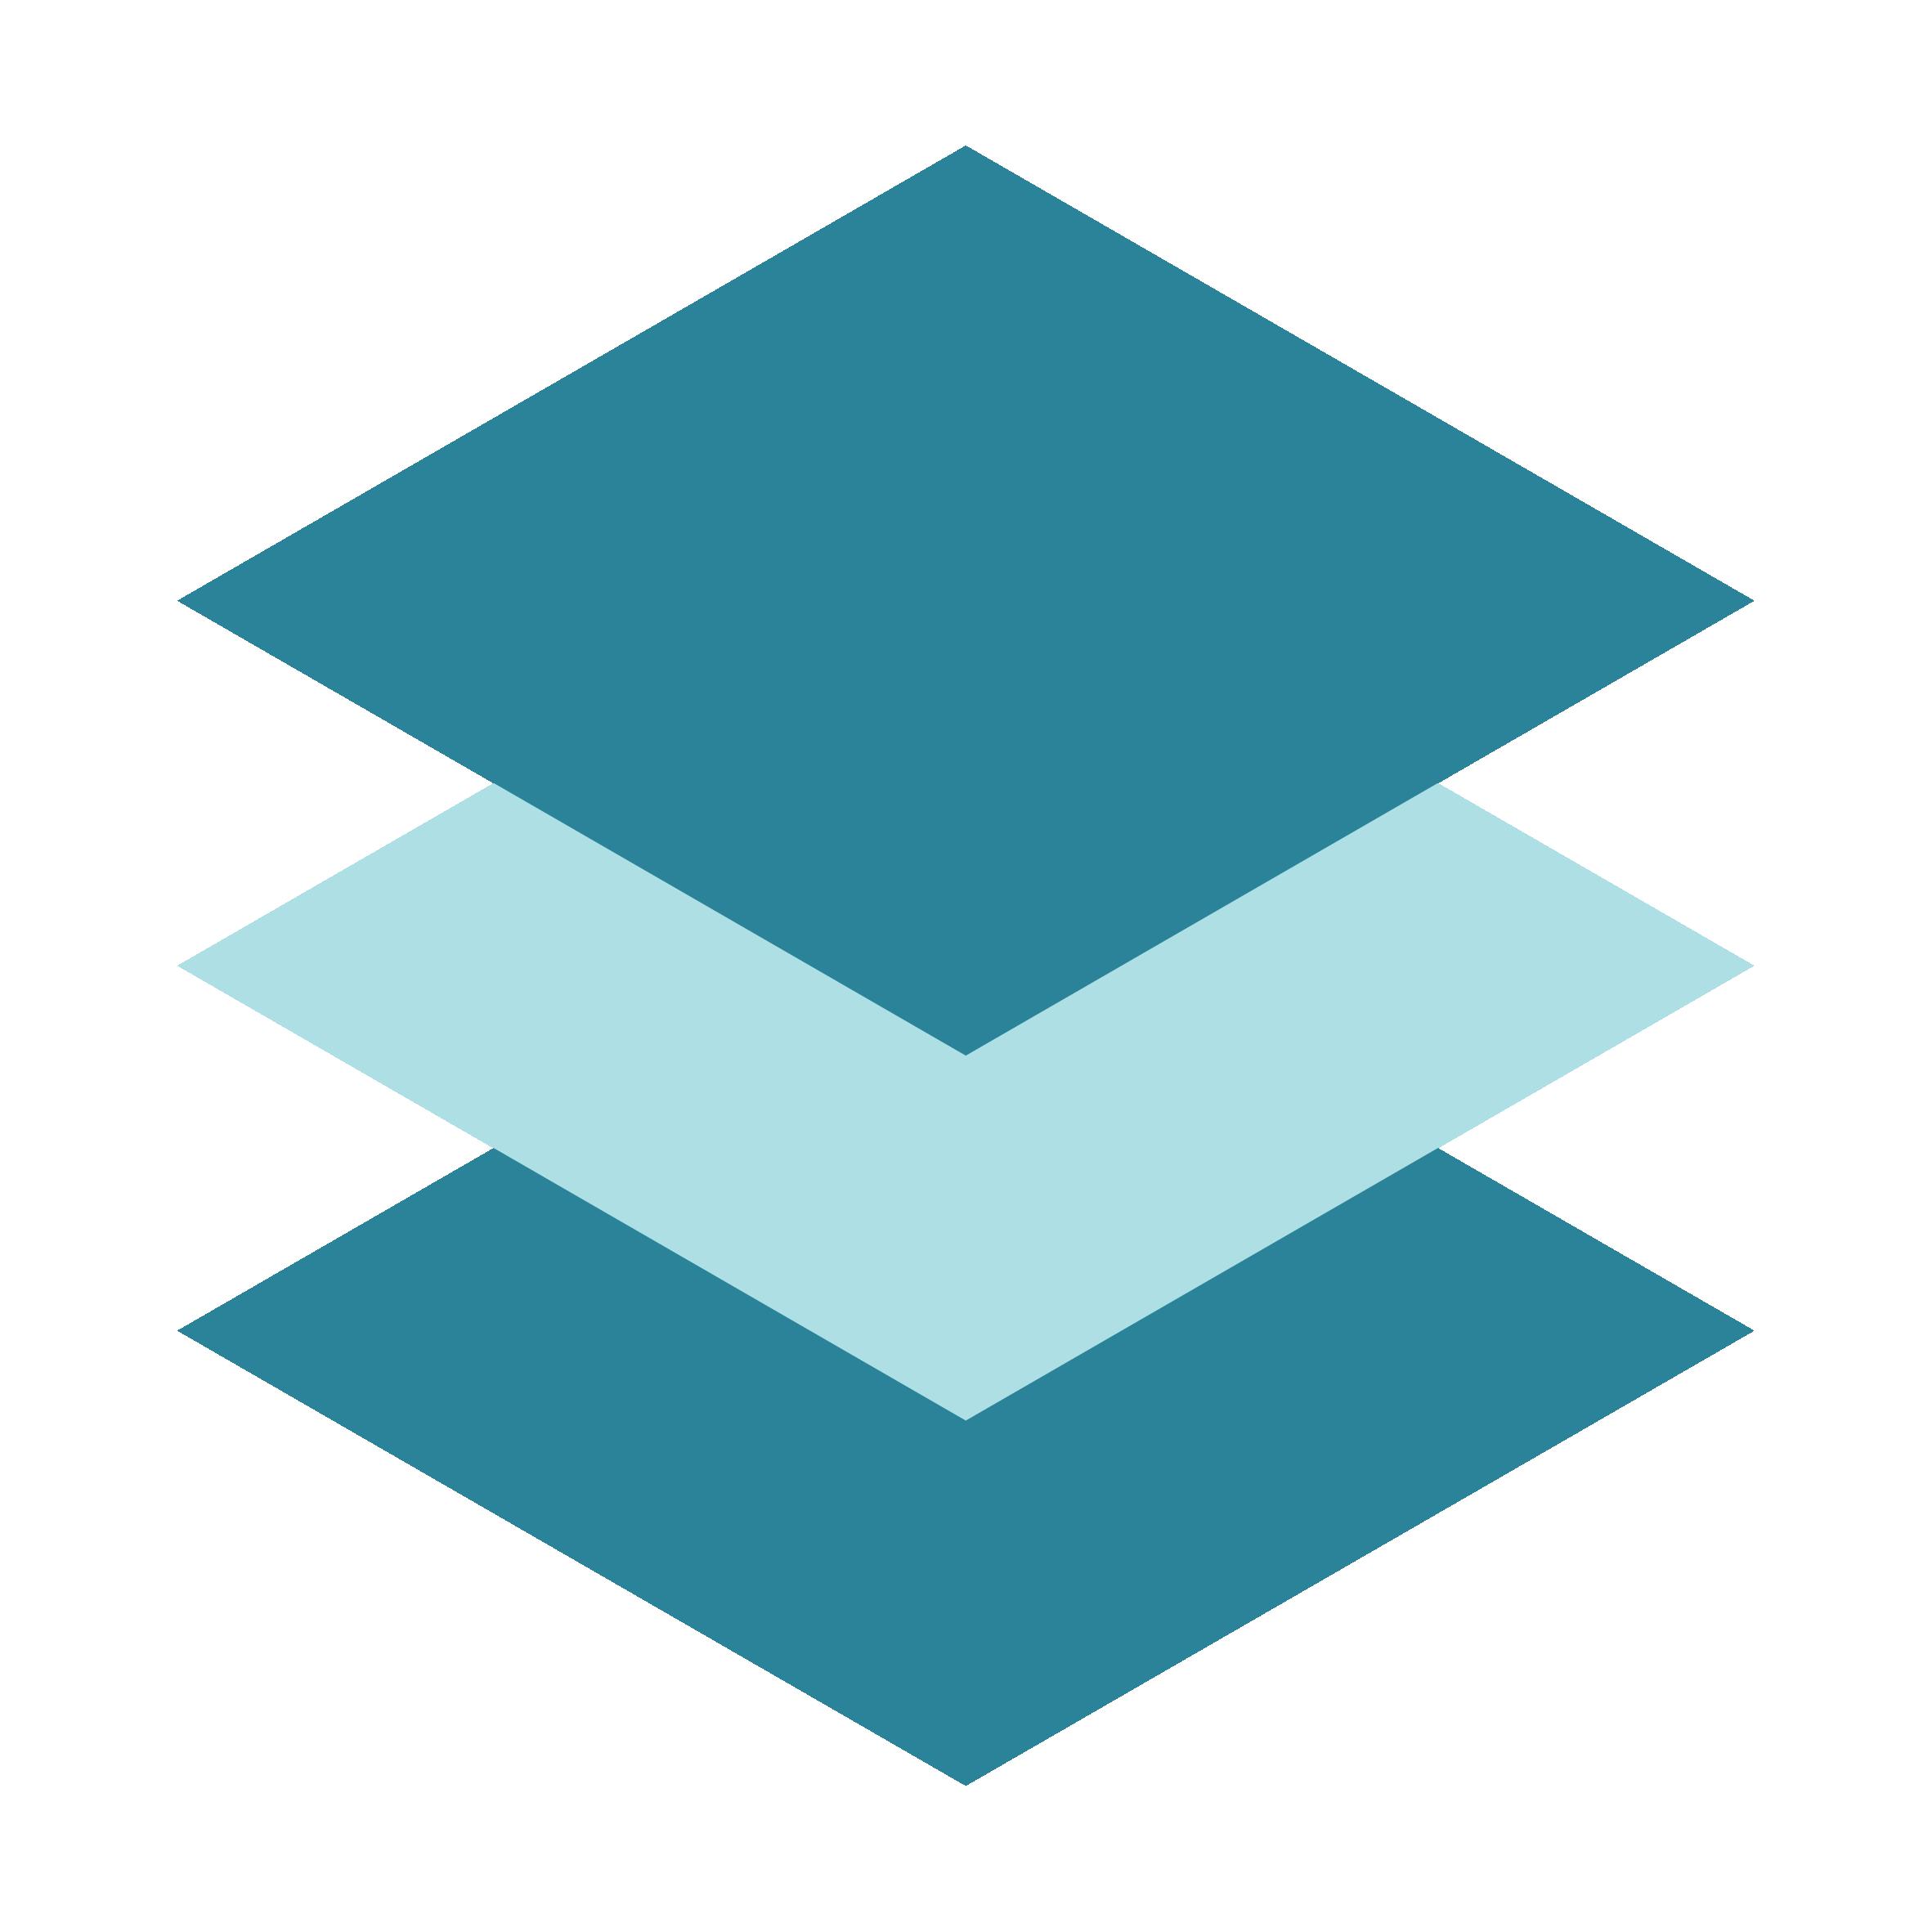 Fully compliant signature platform icon